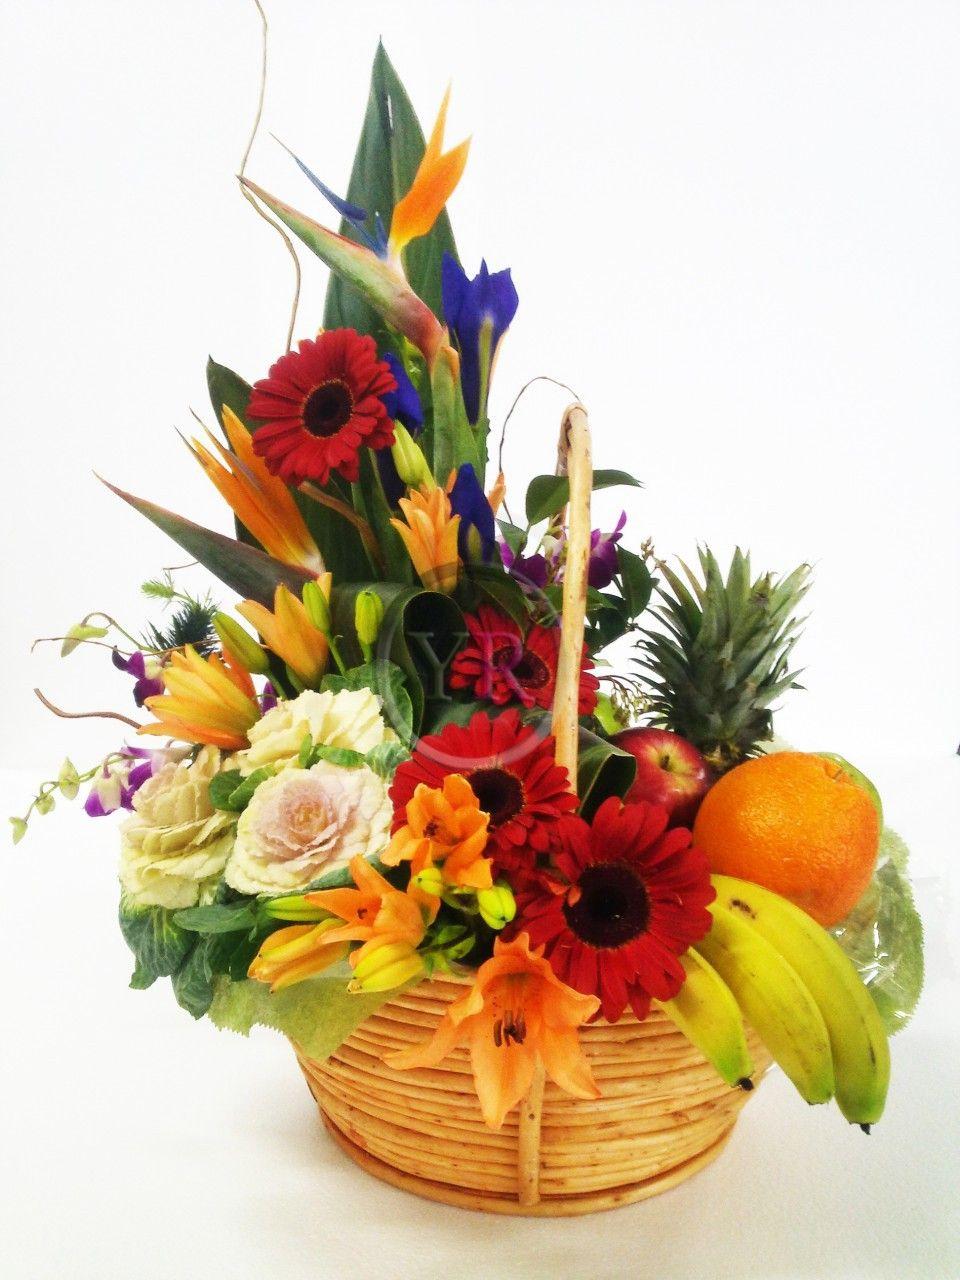 Basket Flower Decoration Fruit Flower Arrangements Canada Flowers Fruit And Gourmet